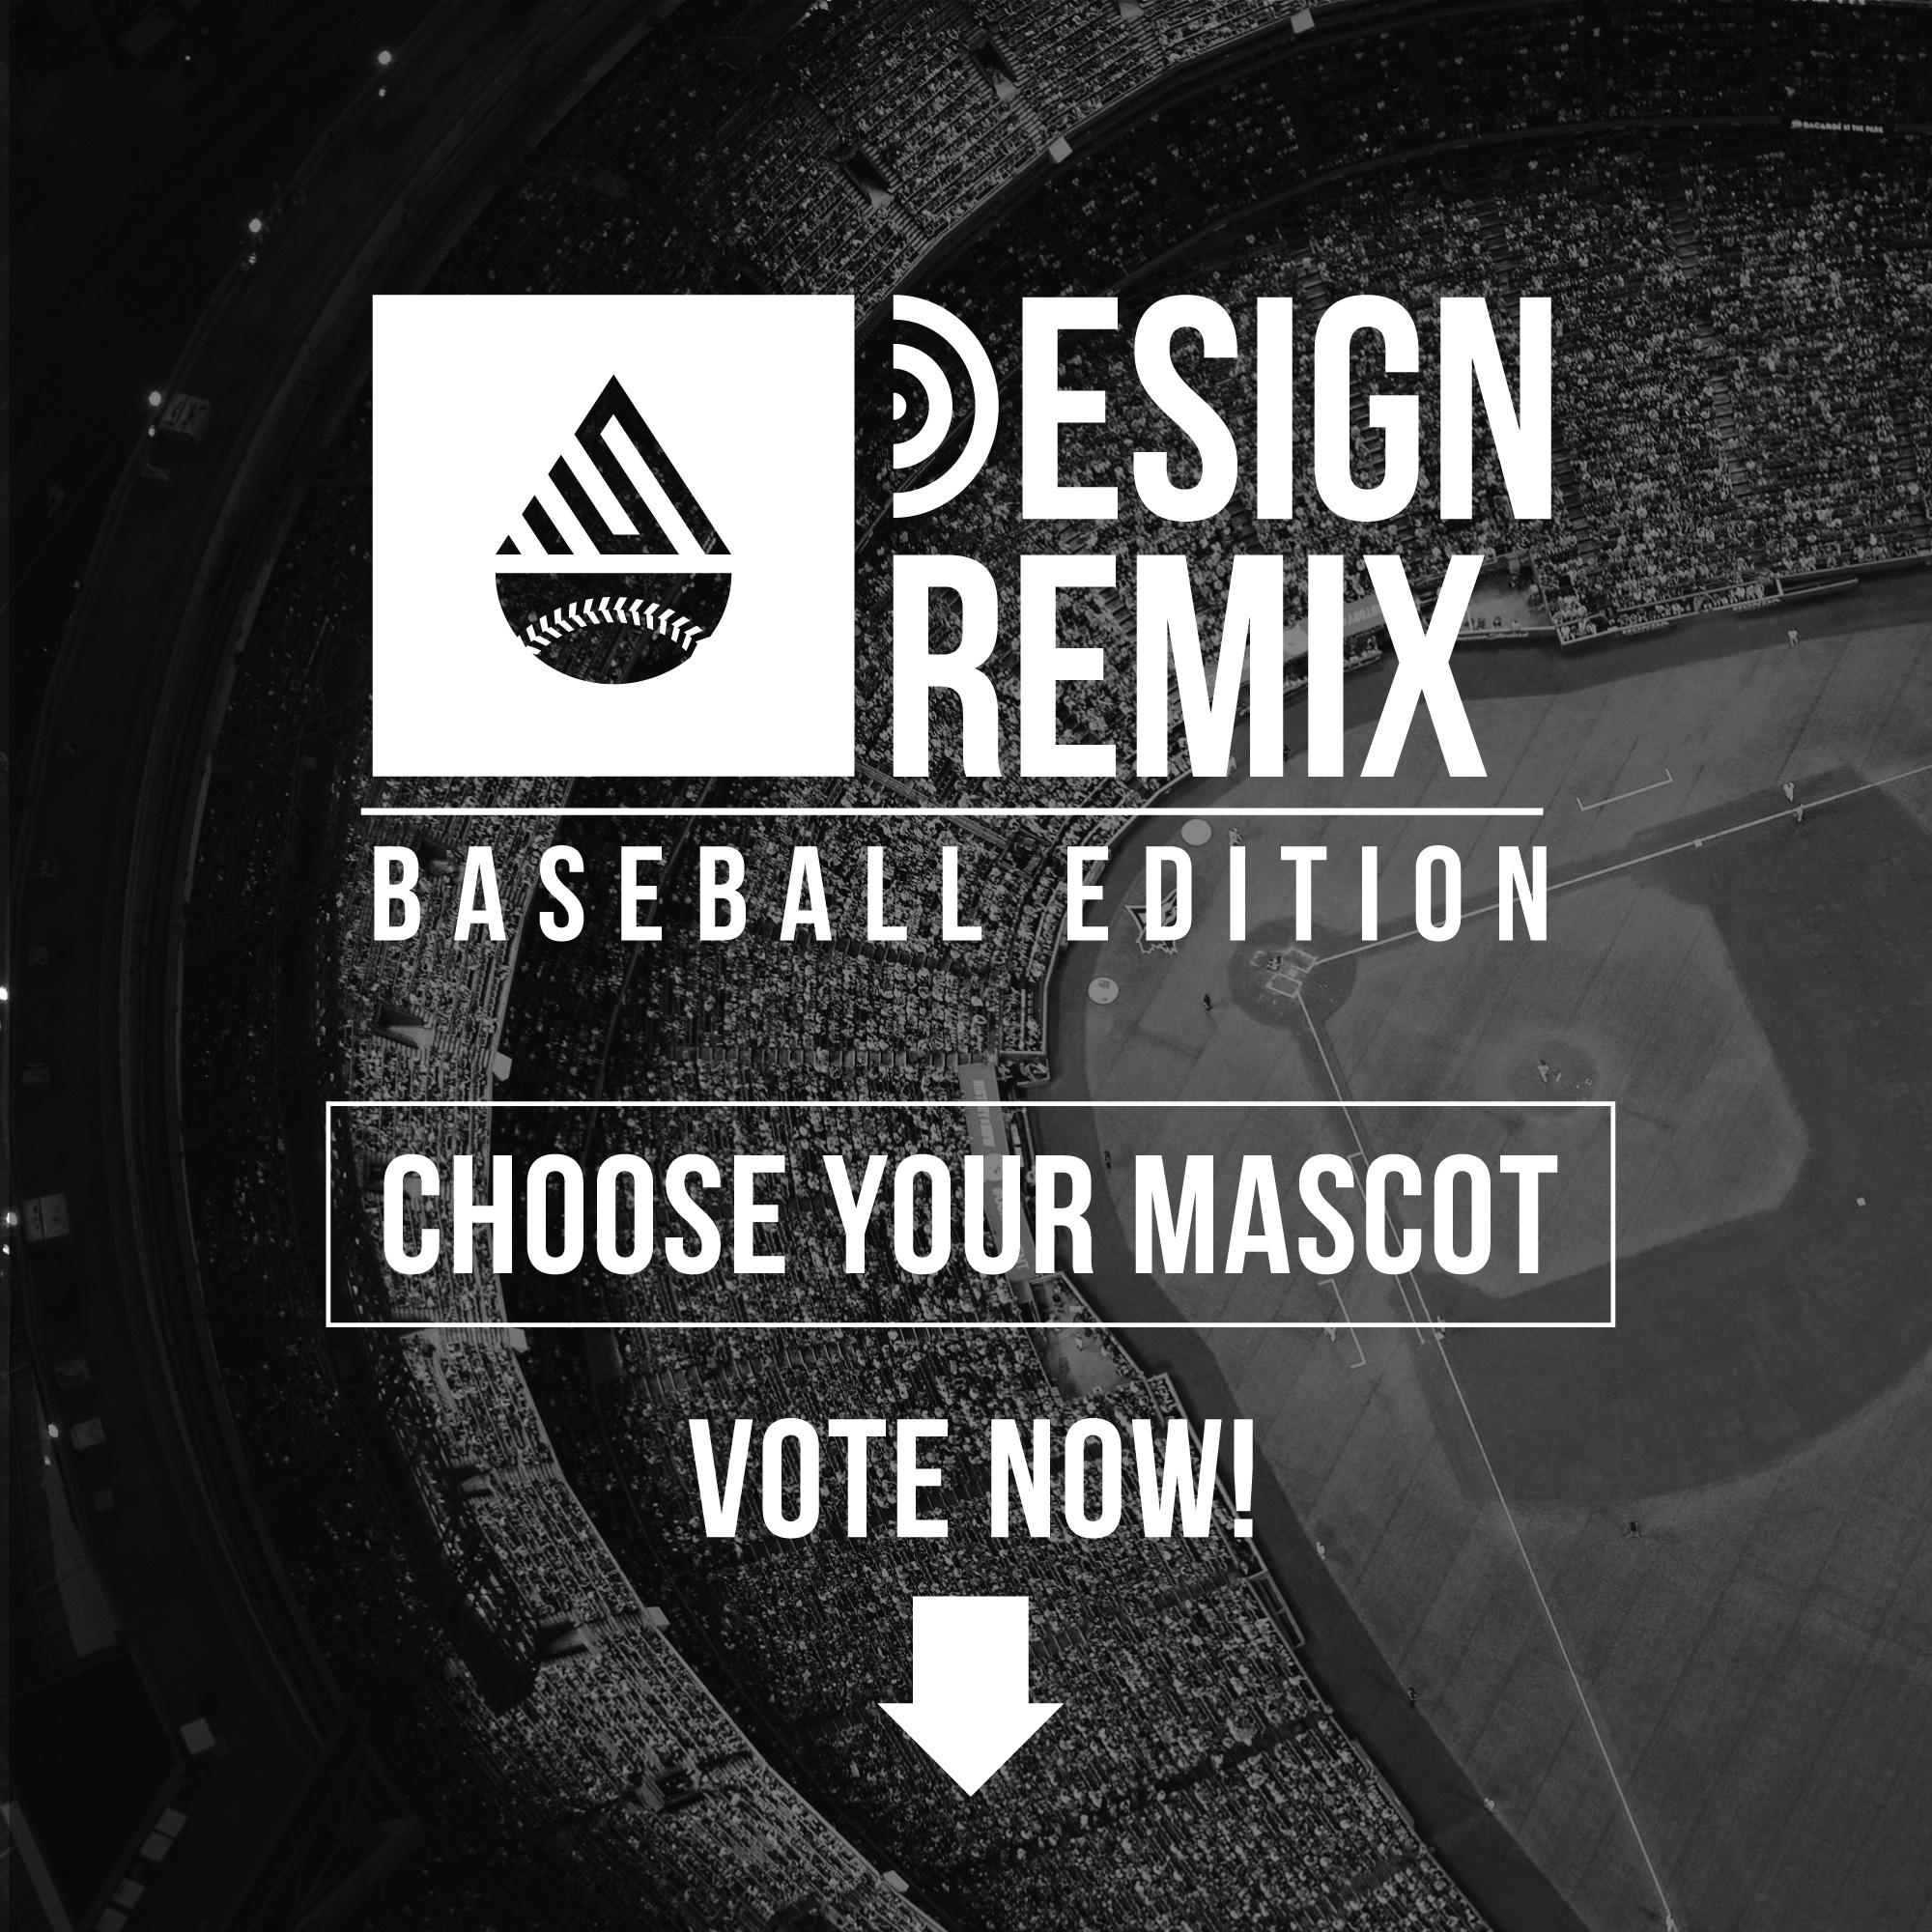 design_remix_baseball.jpg